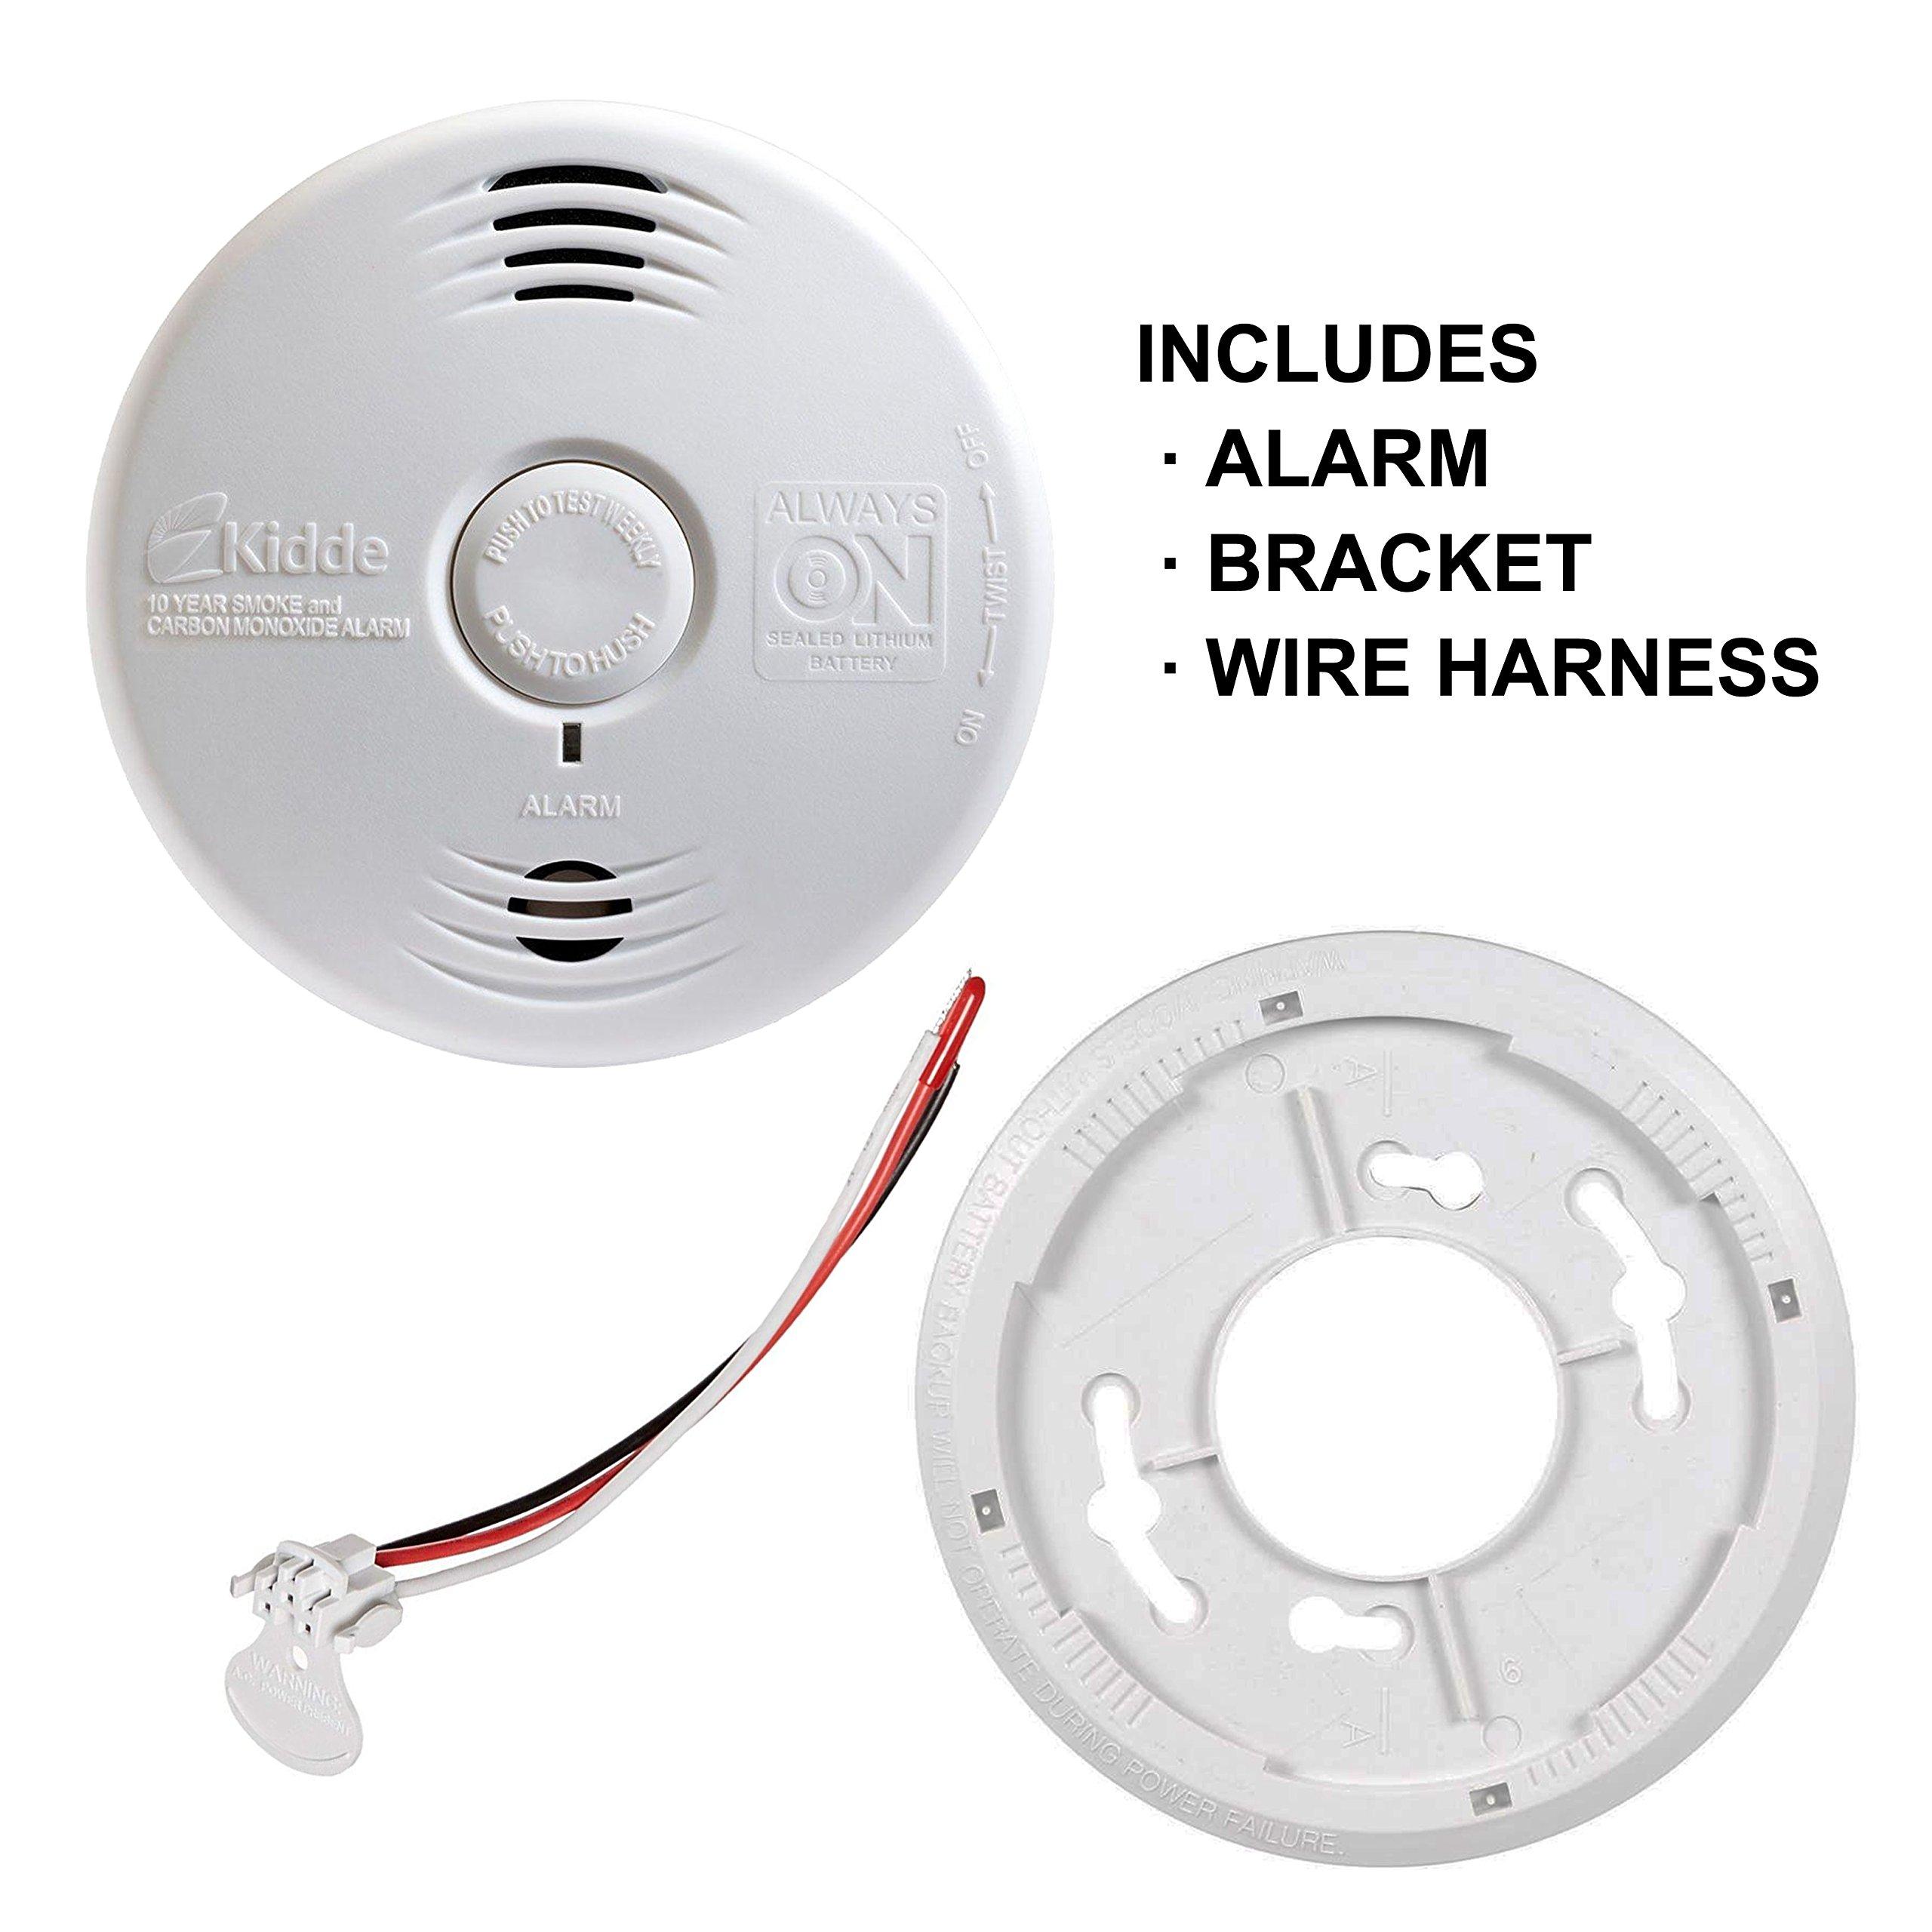 Worry-Free Hardwired Smoke & Carbon Monoxide Alarm with Lithium Battery Backup I12010SCO by Kidde (Image #2)